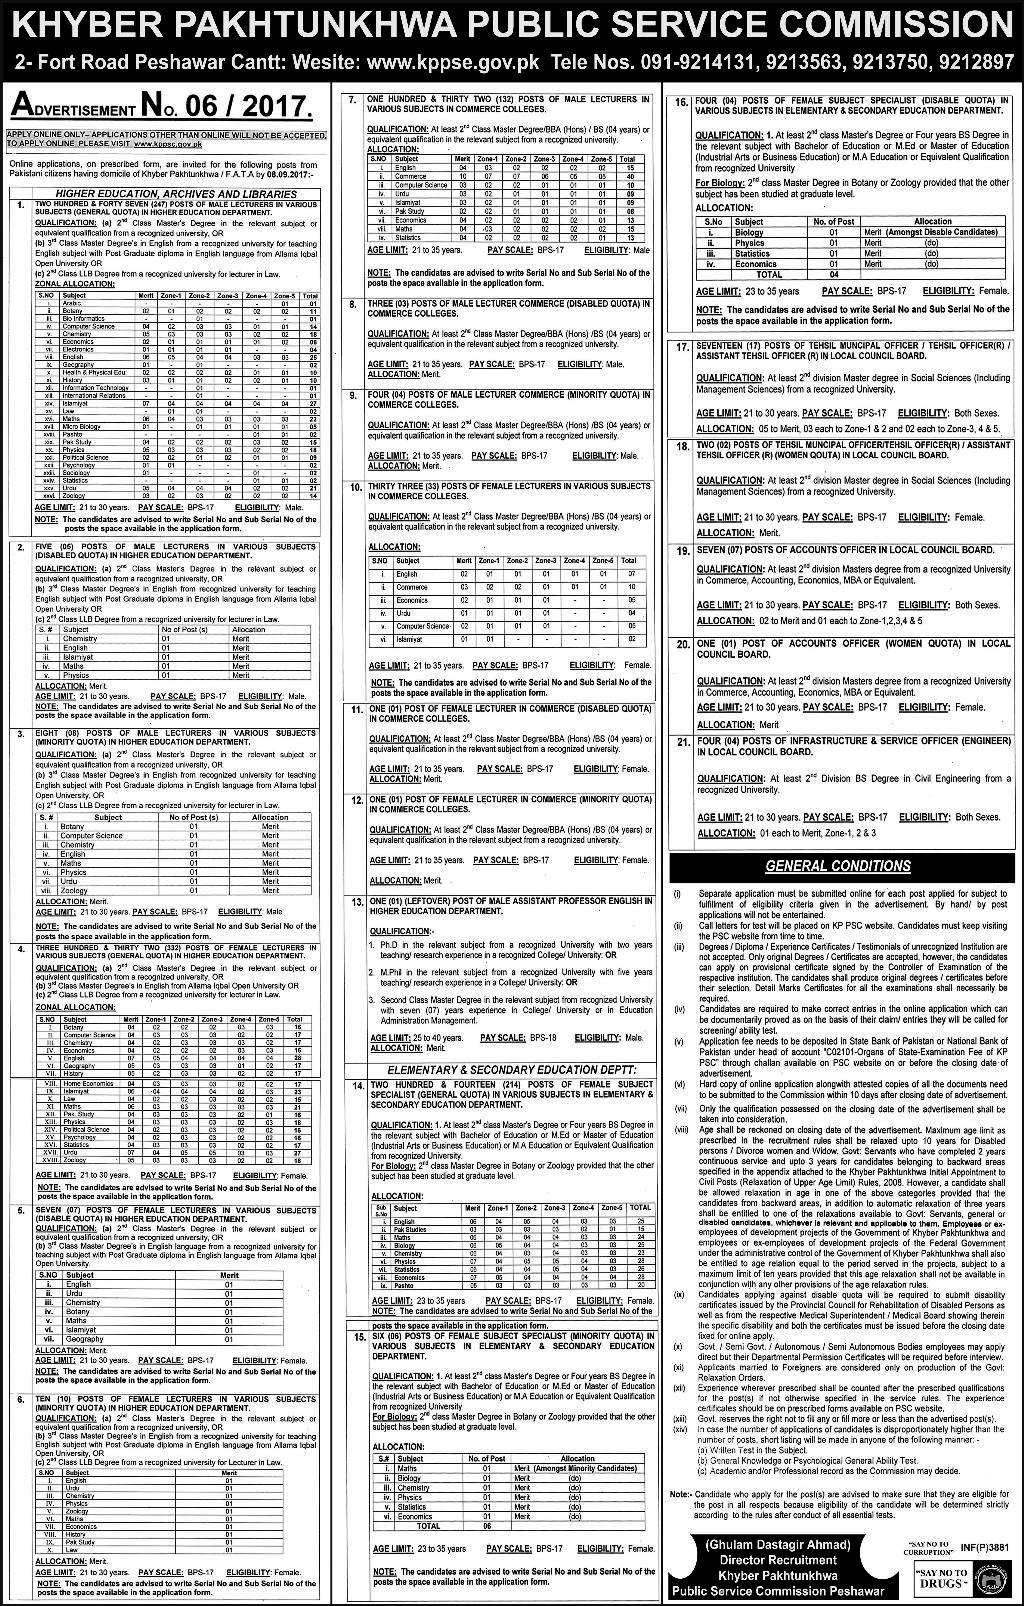 KPK Commission Jobs 2017 Latest Khyber Pakhtunkhwa Public Service Commission